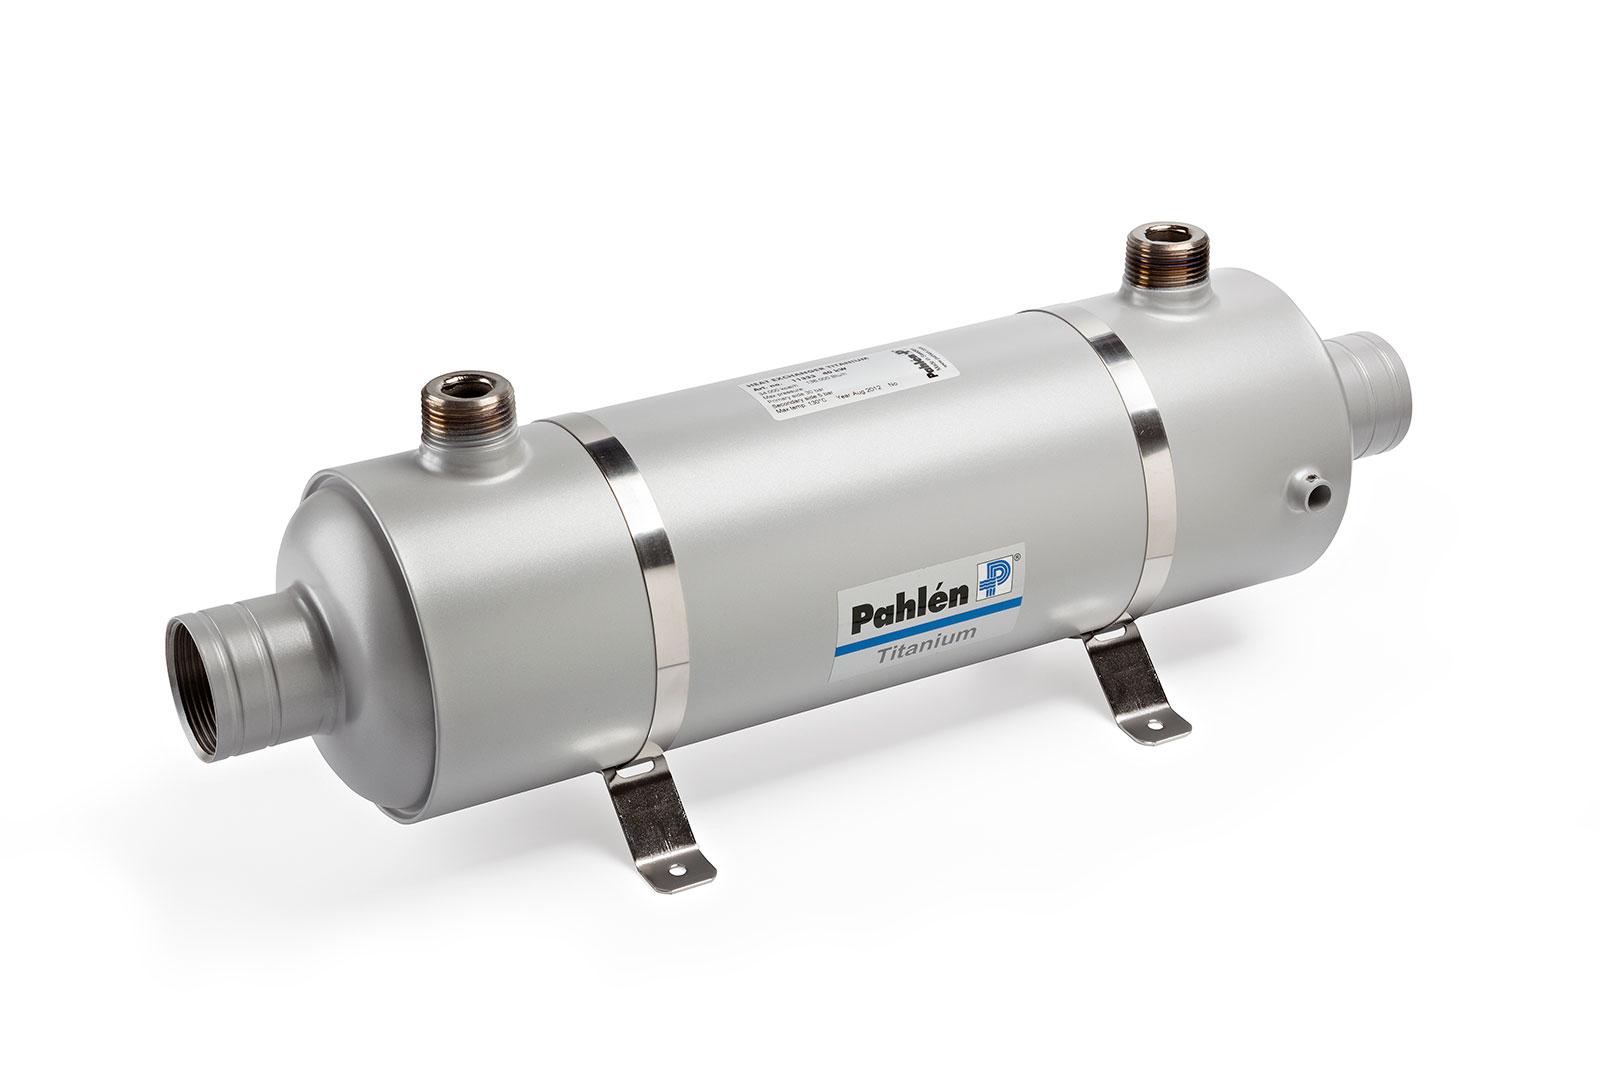 Heat exchanger Hi-Flow titanium